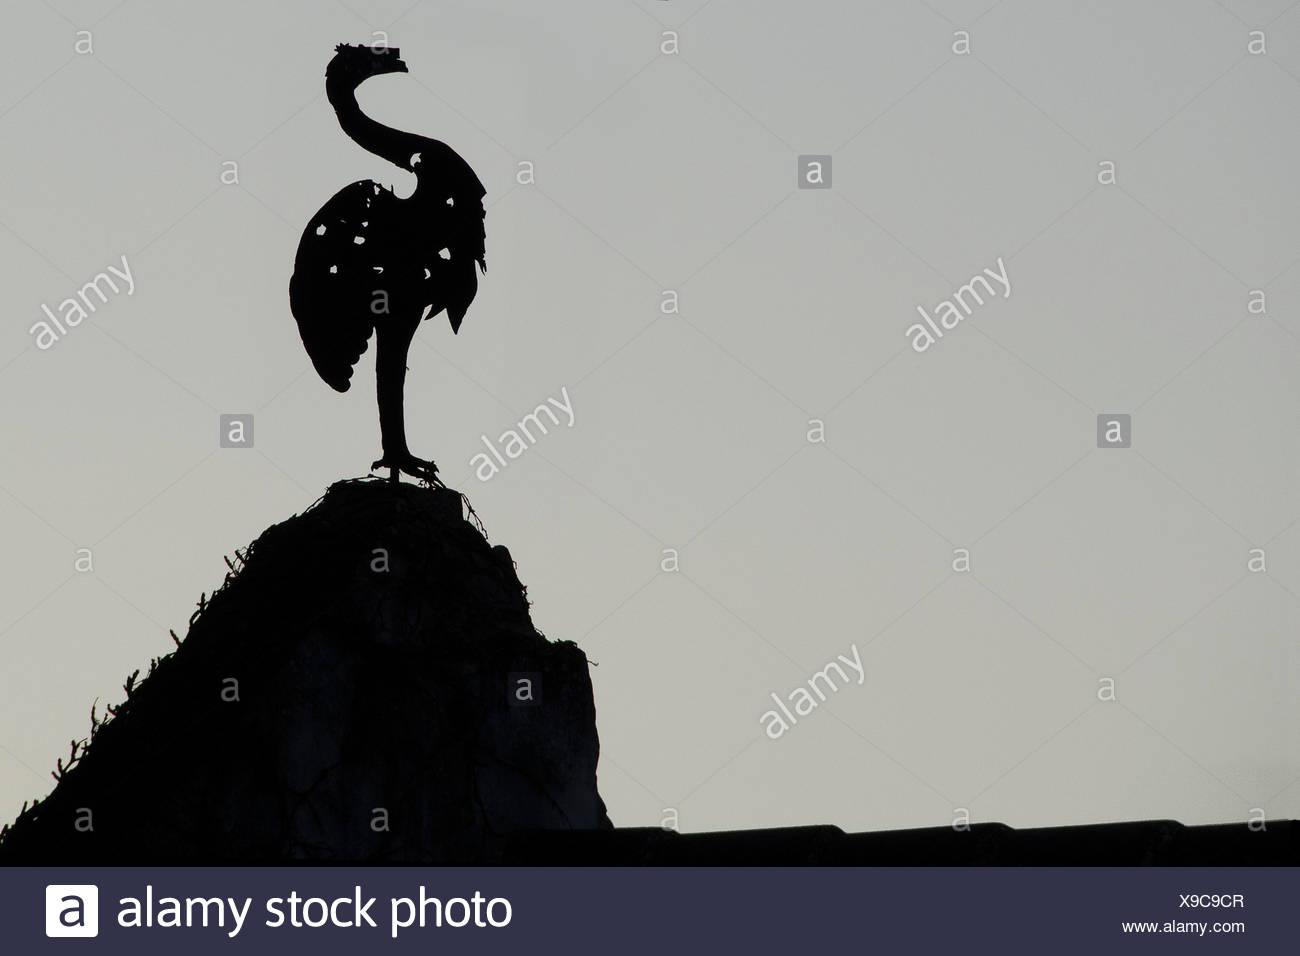 Silhouette eines Fabeltieres auf dem Giebel eines Schlosses, Mühlbach, Niederösterreich, Österreich, 2011; silhouette of a fabulous beast at the gable of a palace, Muehlbach, Lower Austria, Austria, 2011 Stock Photo